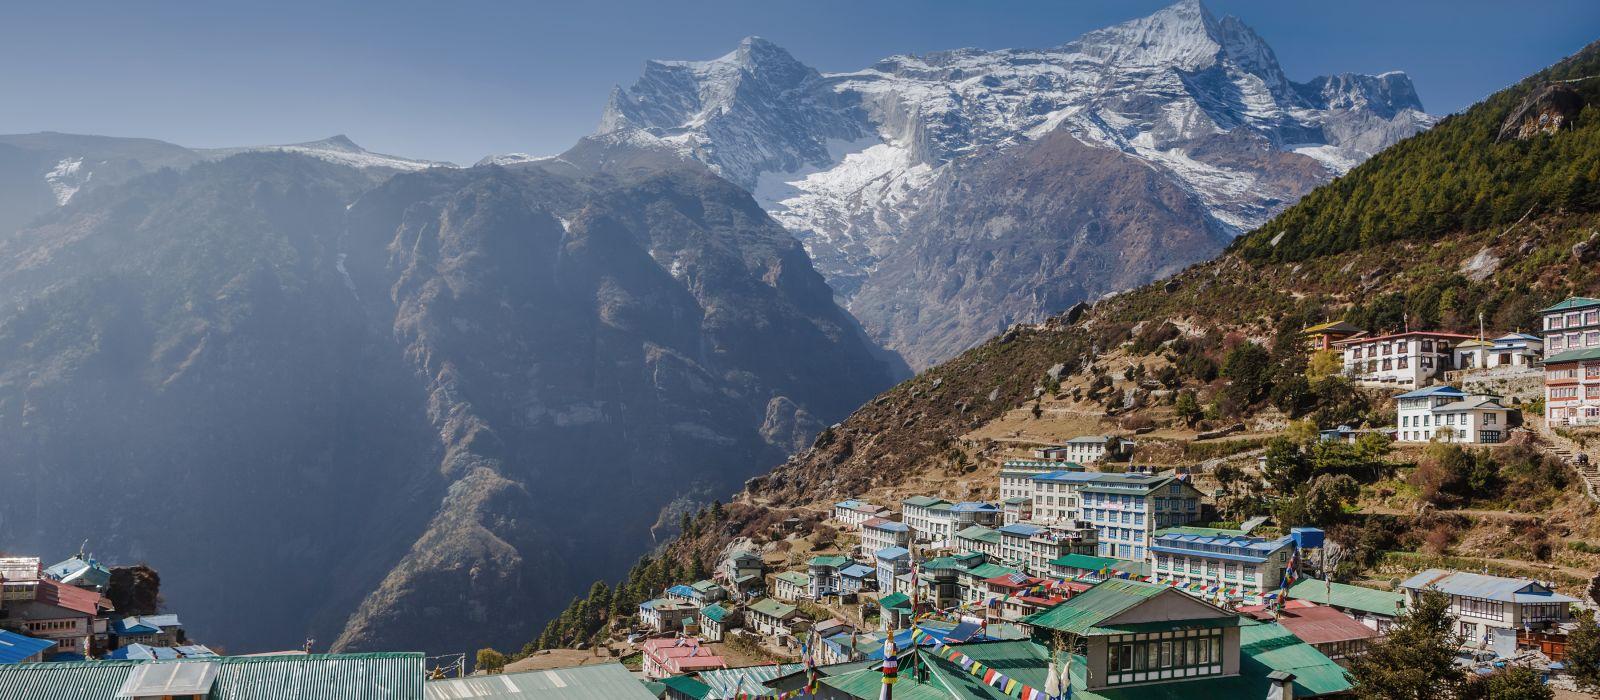 Blick auf den Namche Bazar, Bezirk Khumbu, Himalaya, Nepal, Asien